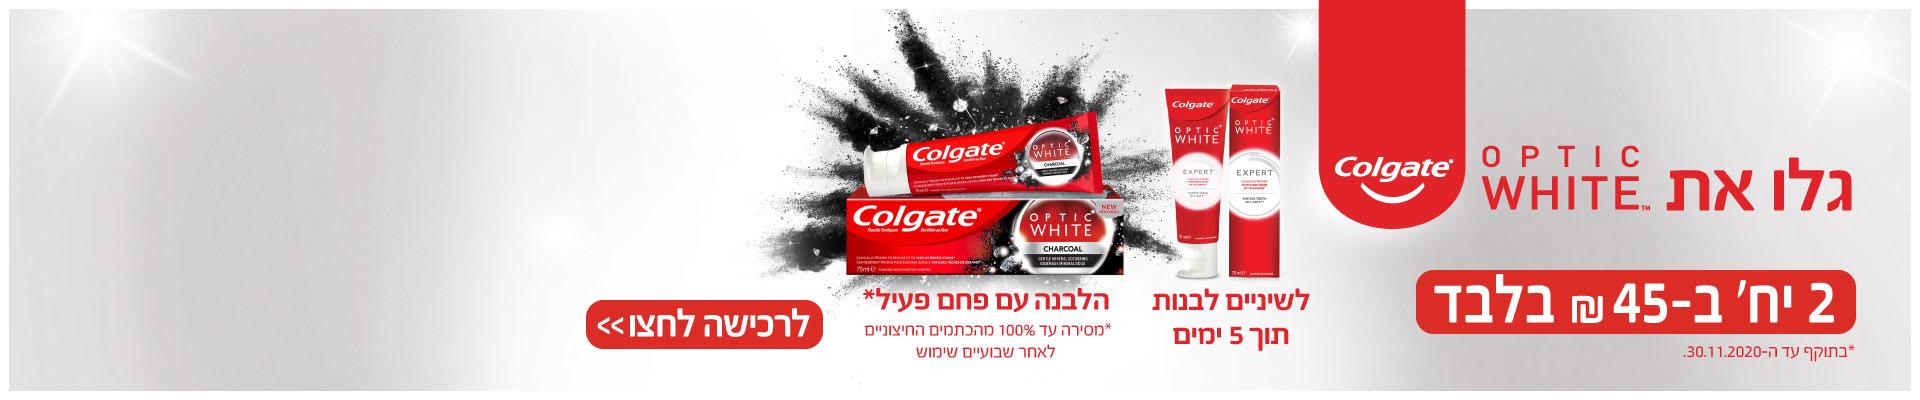 COLGATE OPTOIC WHITE לשיניים לבנות תוך 5 ימים 2 יחידות ב- 45 ₪. בתוקף עד 30.11.2020